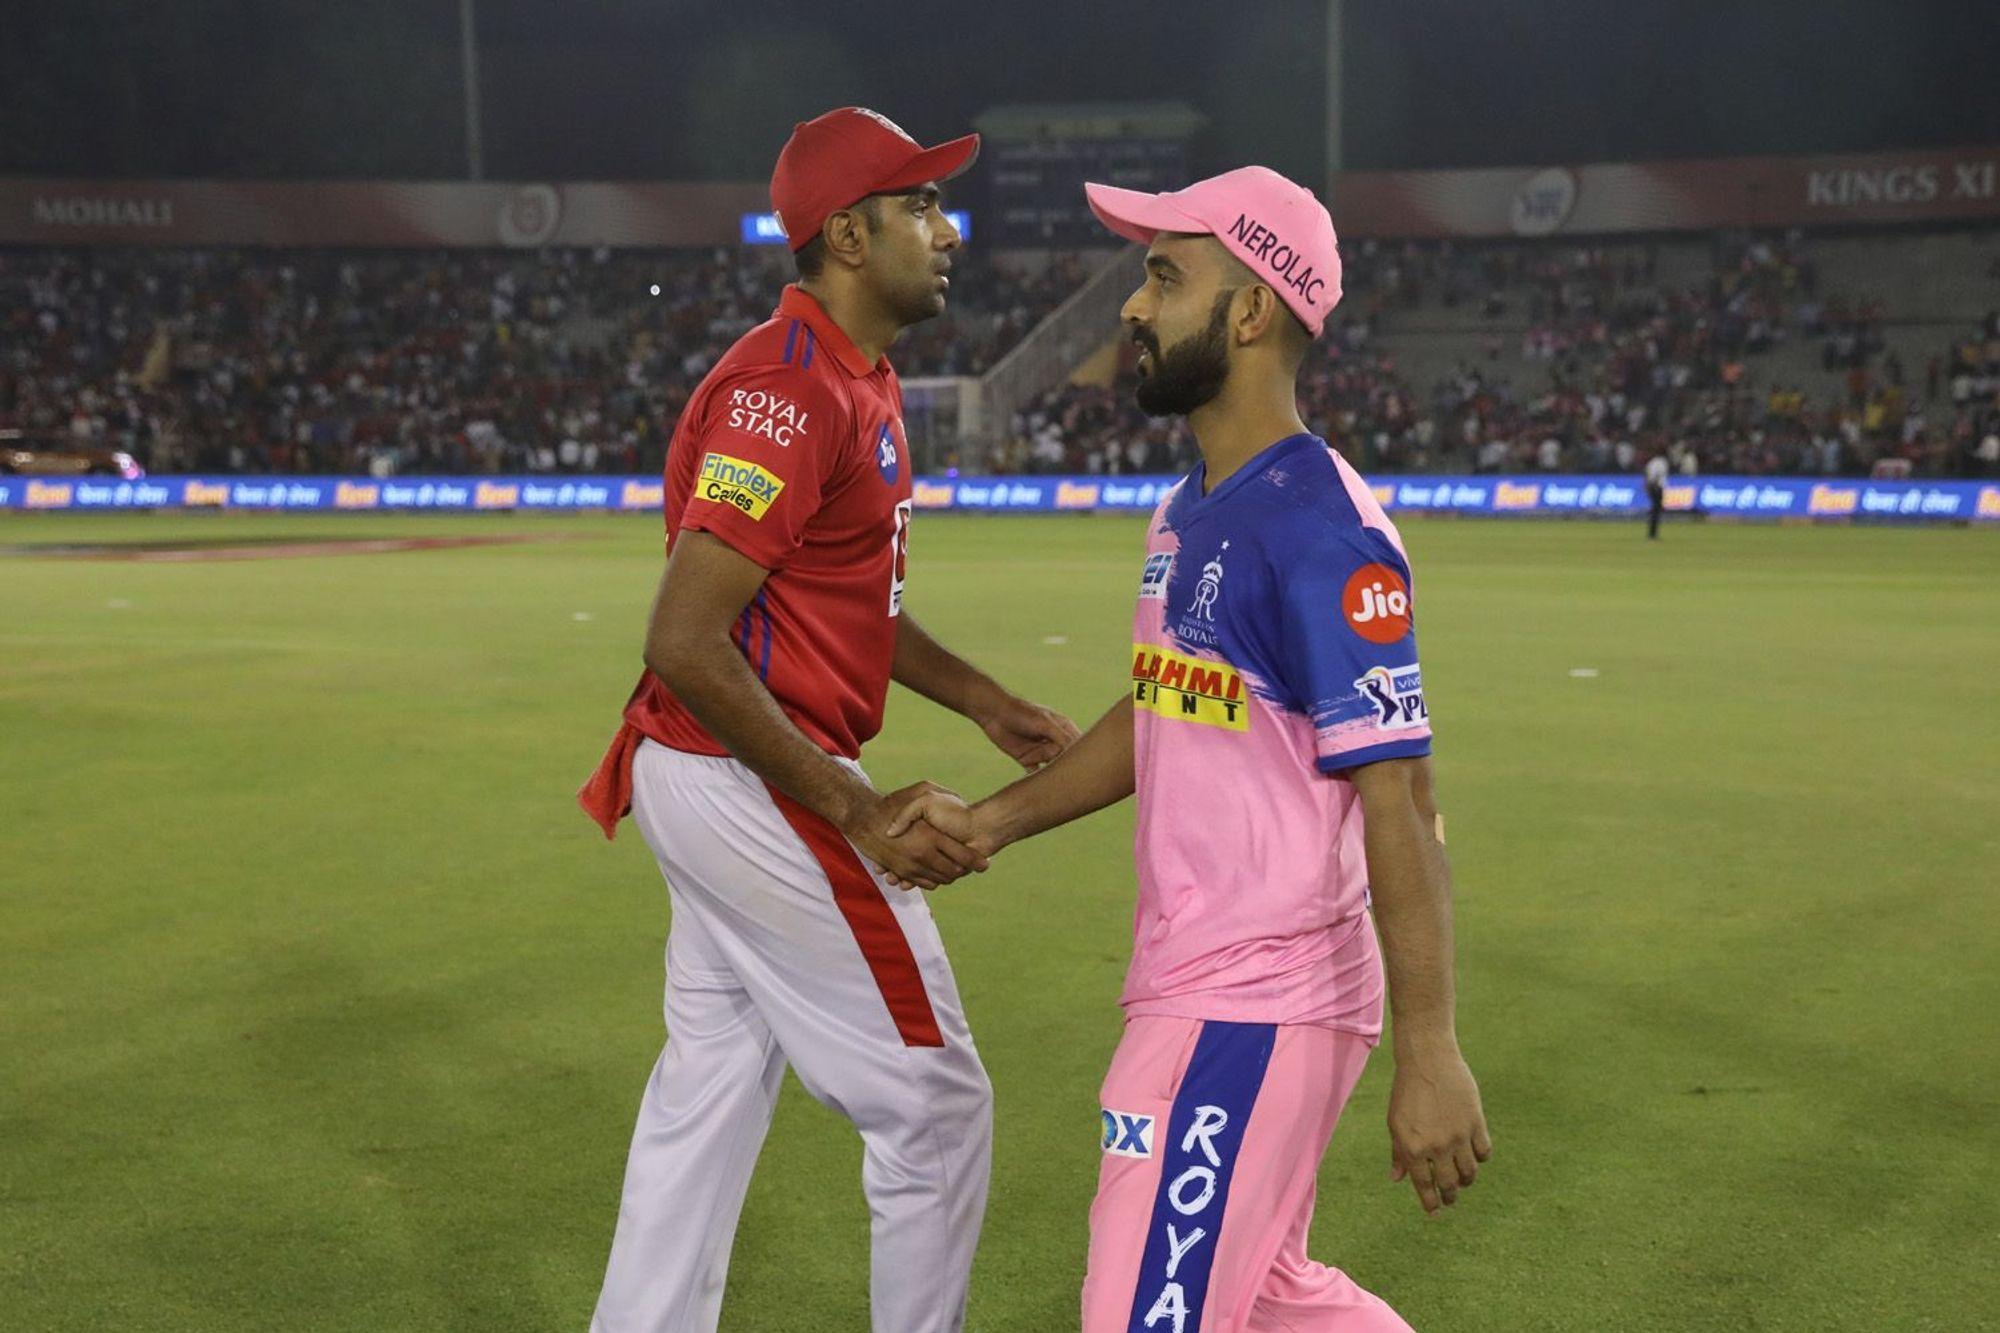 Pin by Lyrics Radar on ipl 2019 World cricket, Cricket